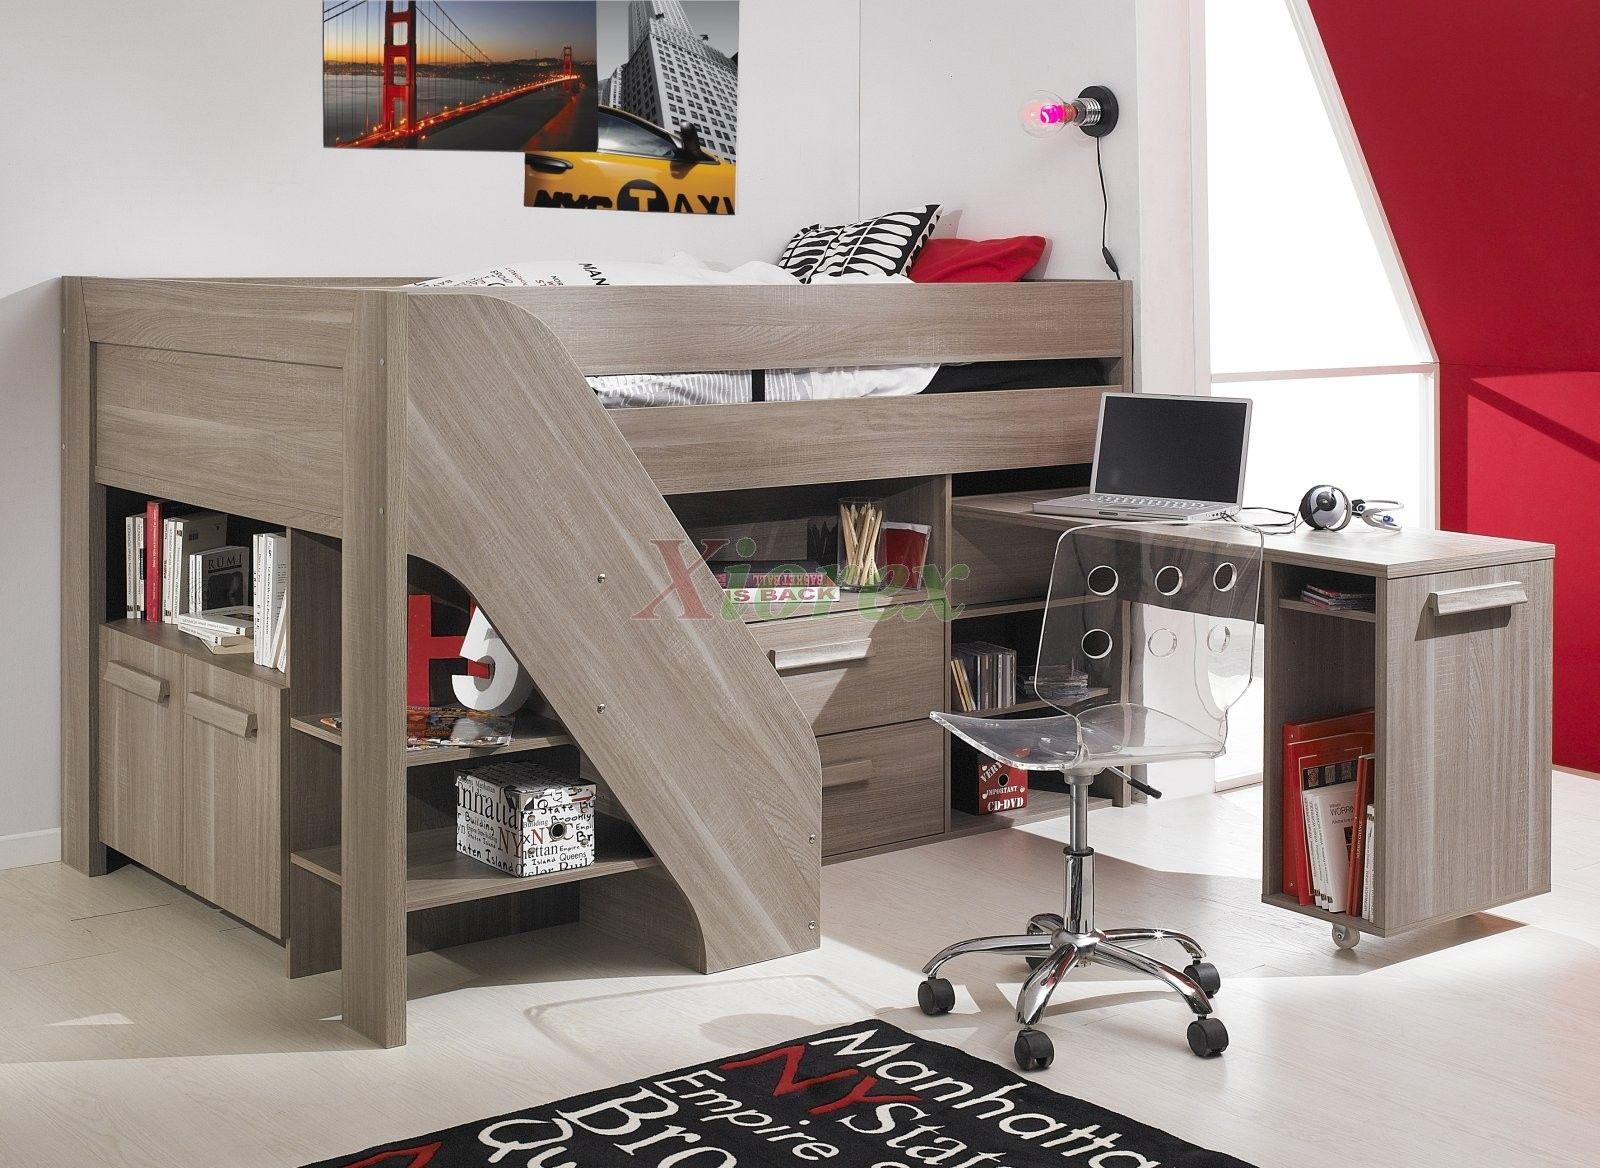 Loft bed with desk for girls  Childrens Bunk Bed with Desk  Furniture Sets for Living Room Check